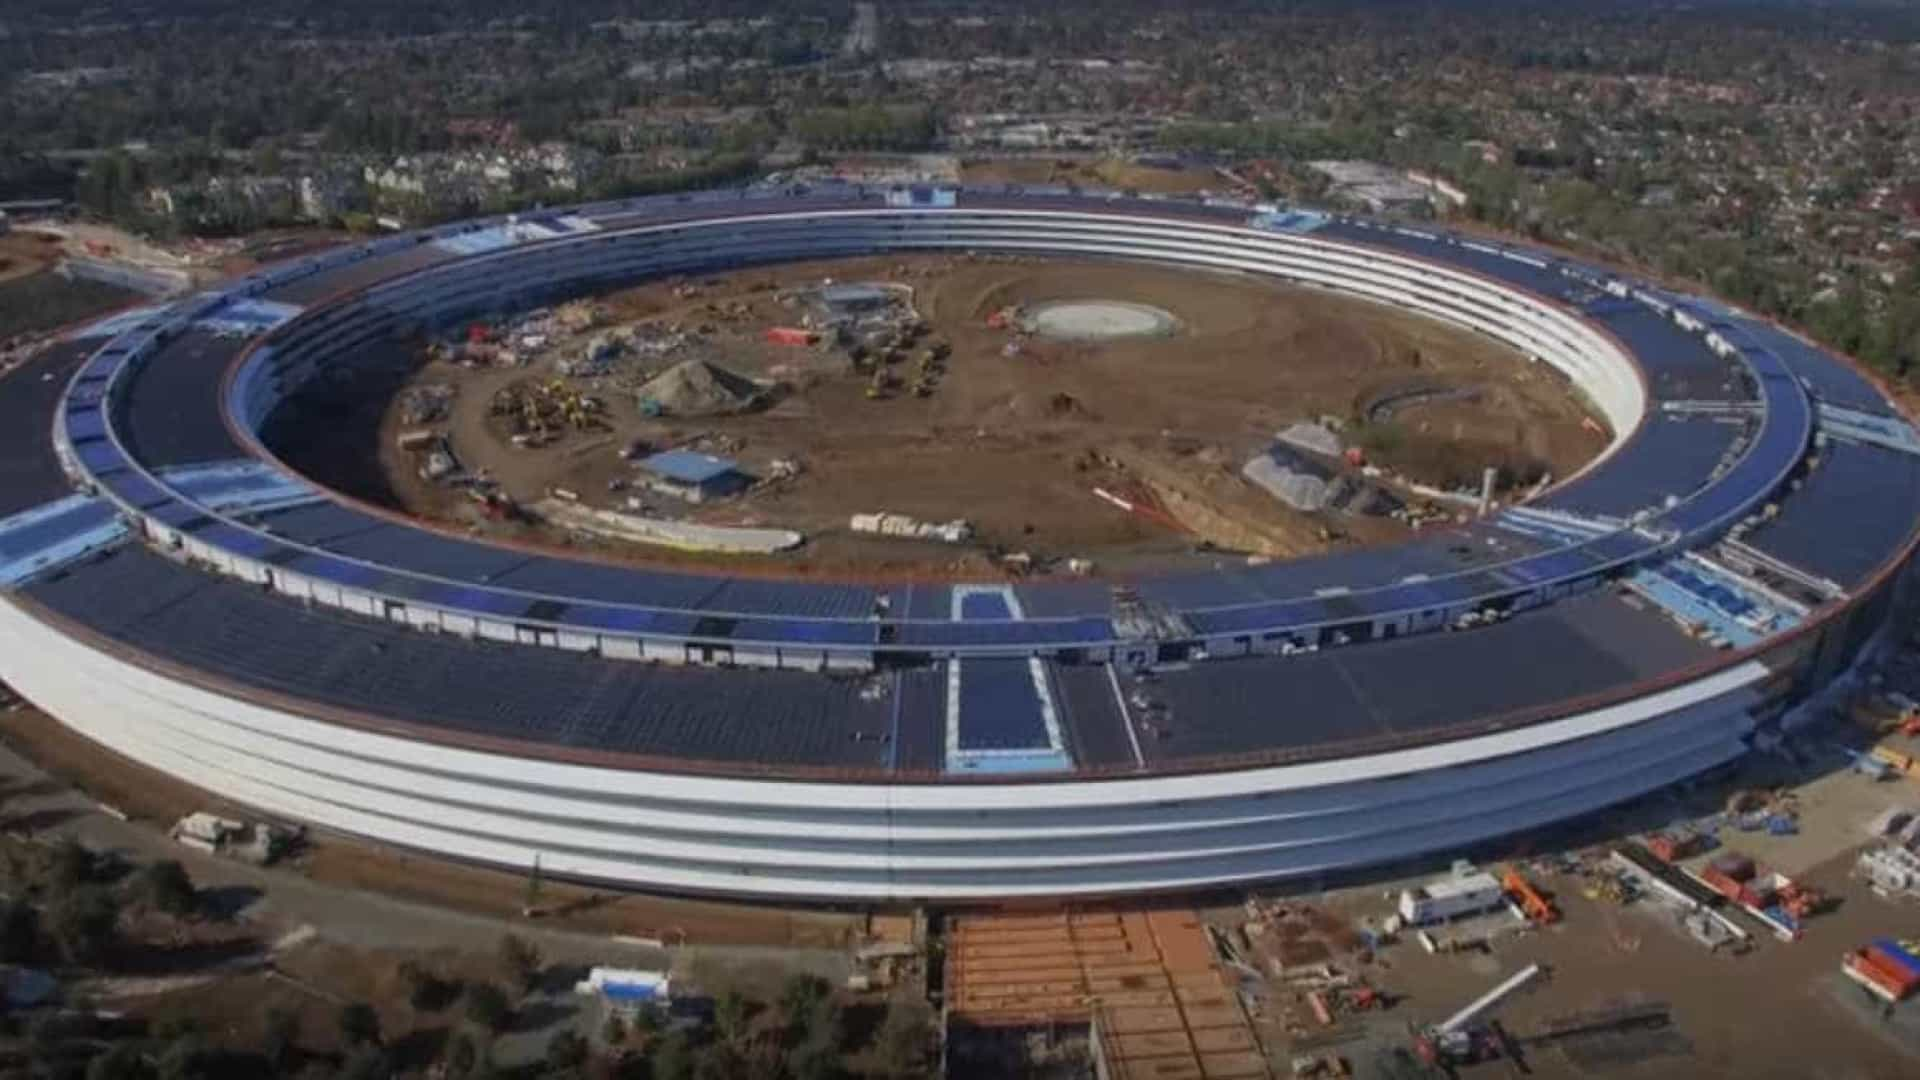 Apple mostra o (pouco) que falta para concluir o seu novo campus